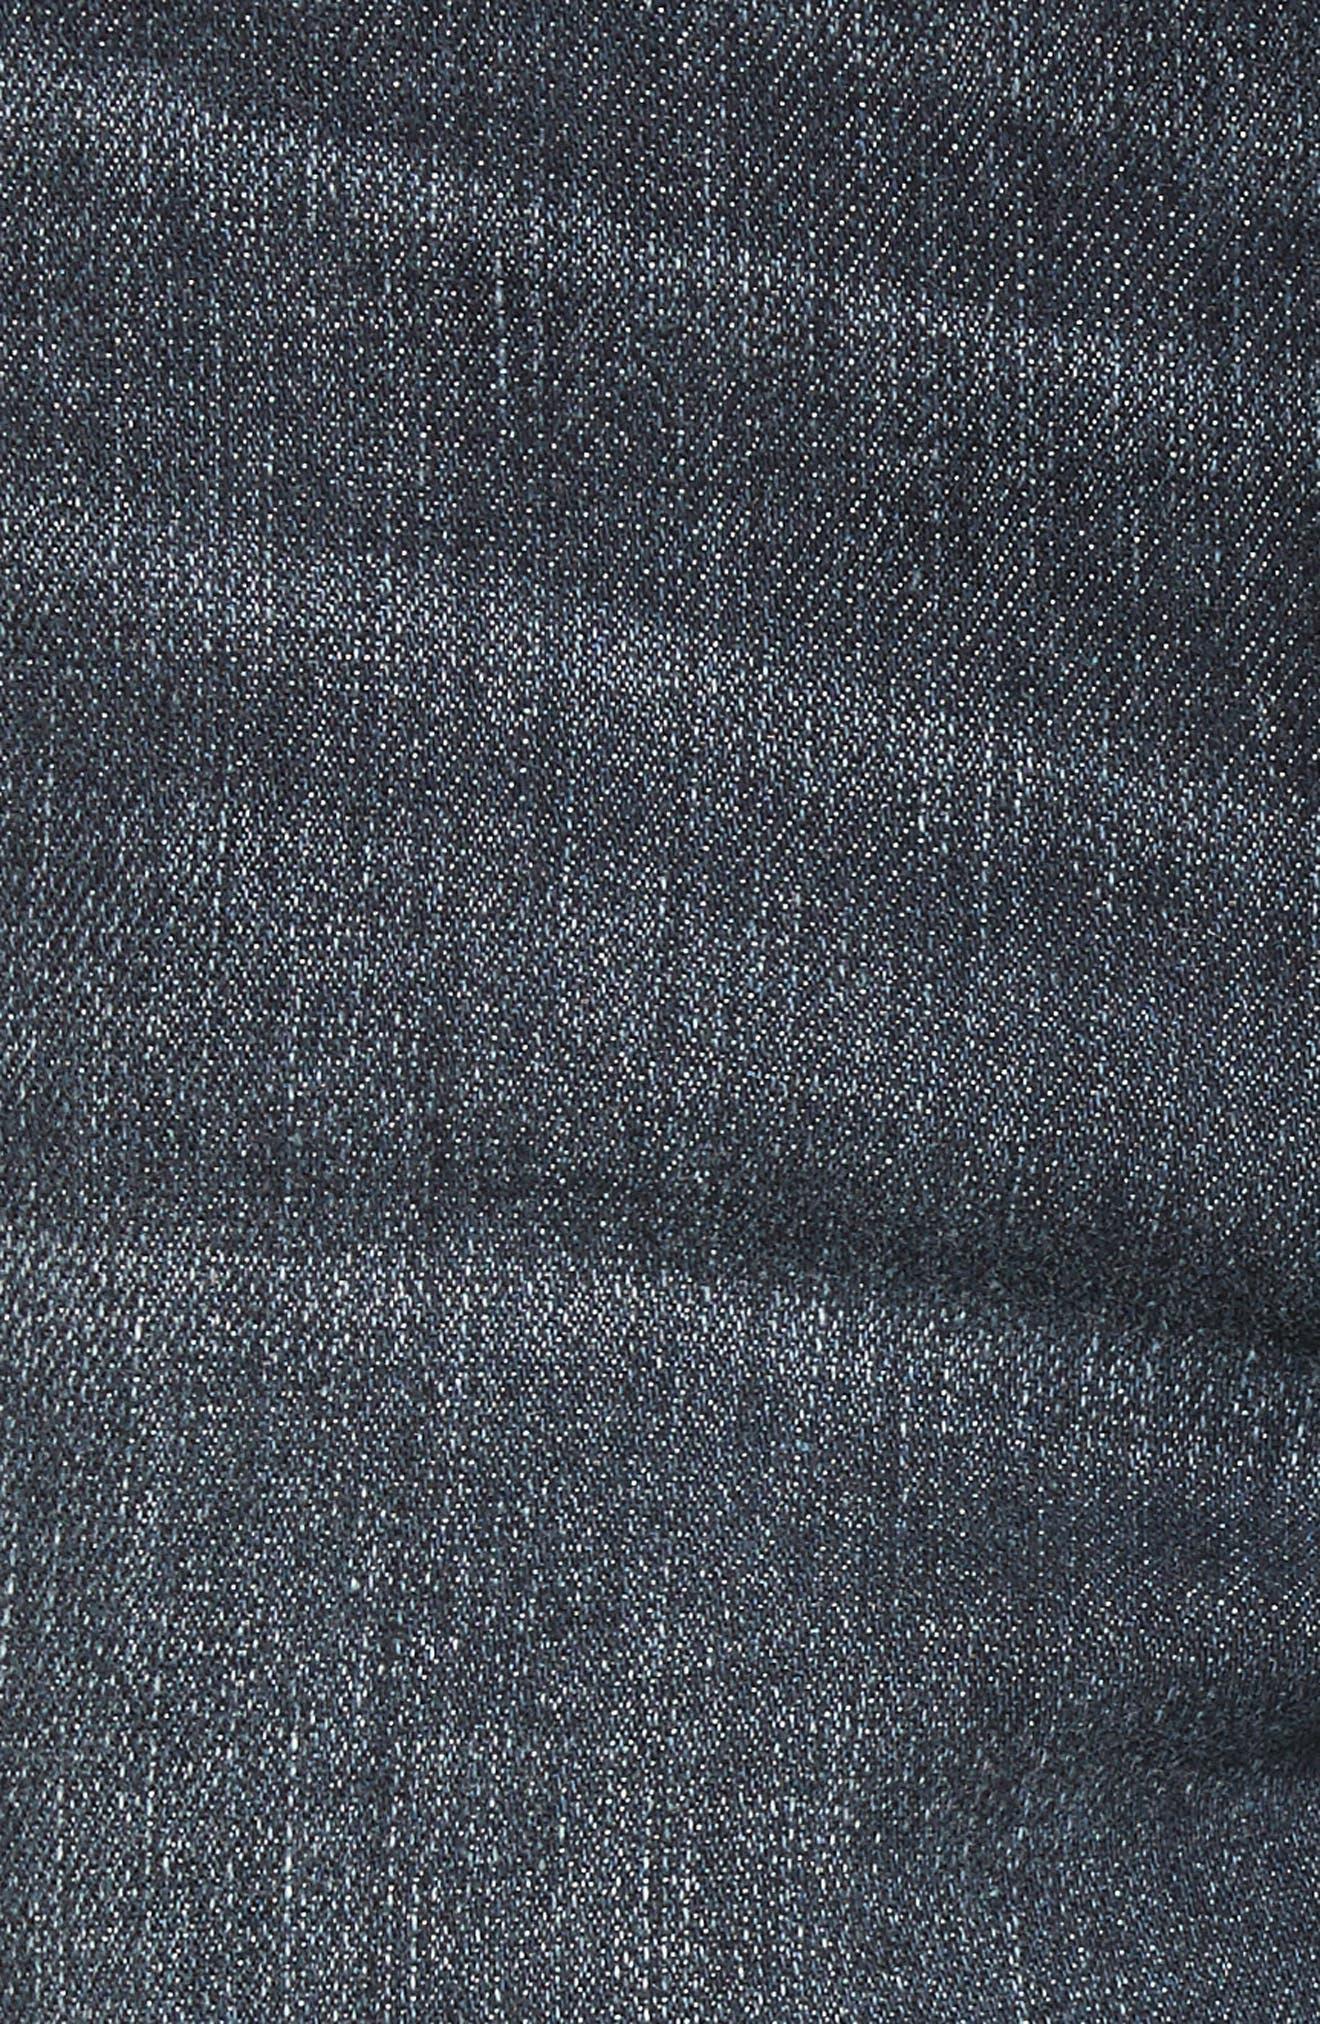 Alternate Image 5  - 1822 Denim Distressed Skinny Jeans (Palin)